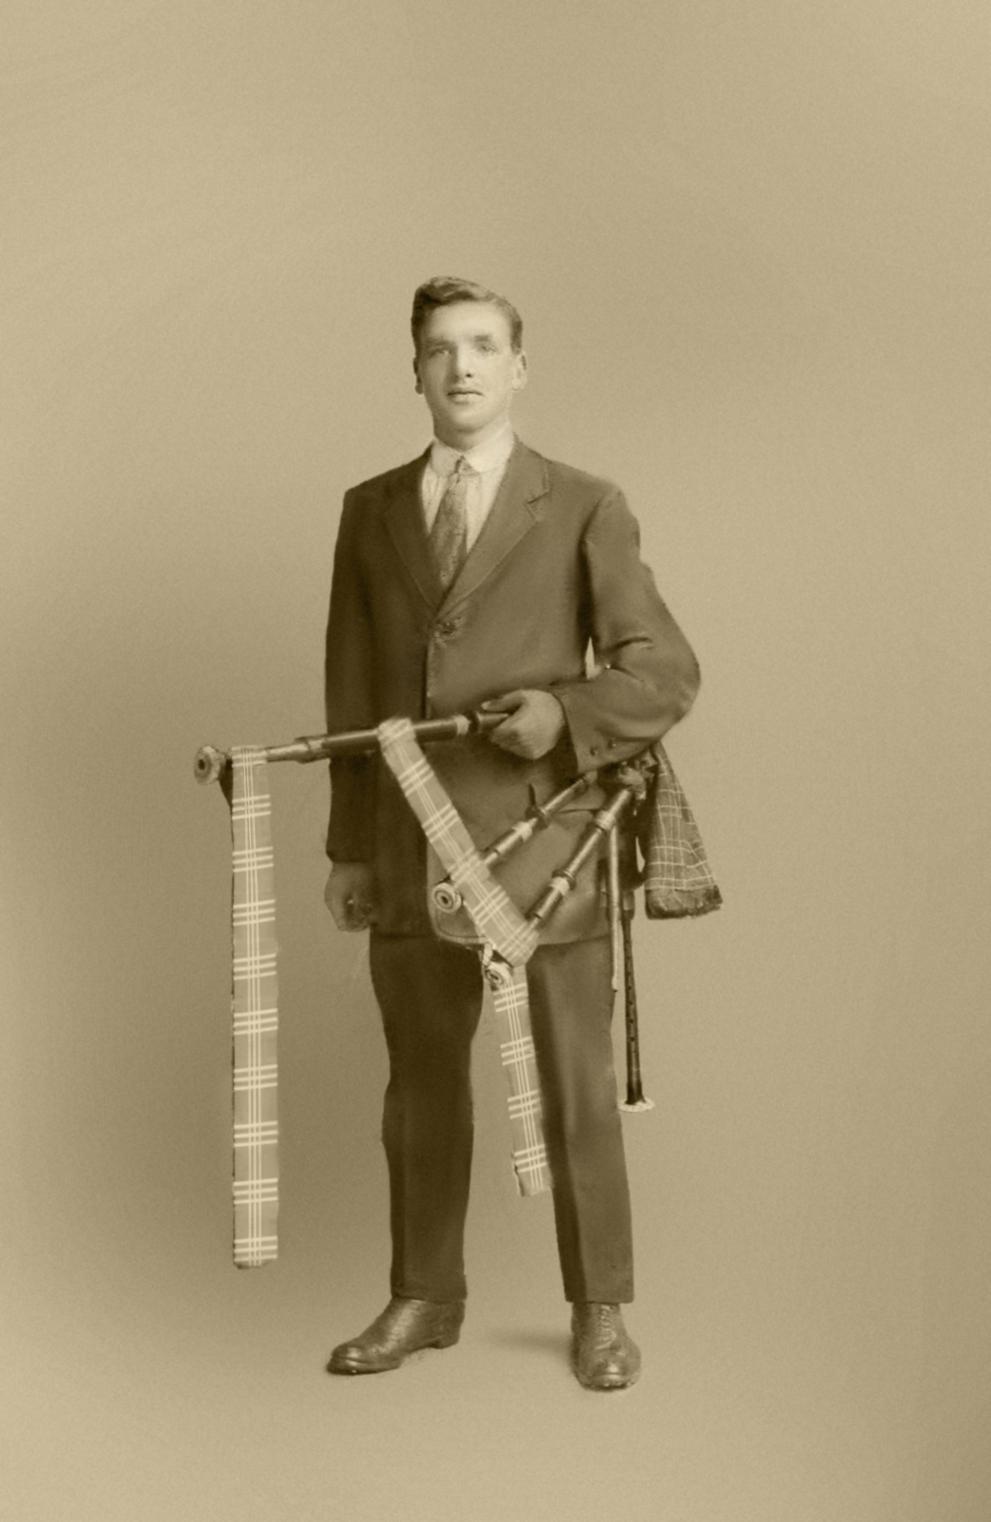 John Fleming professional footballer studio portrait 1912